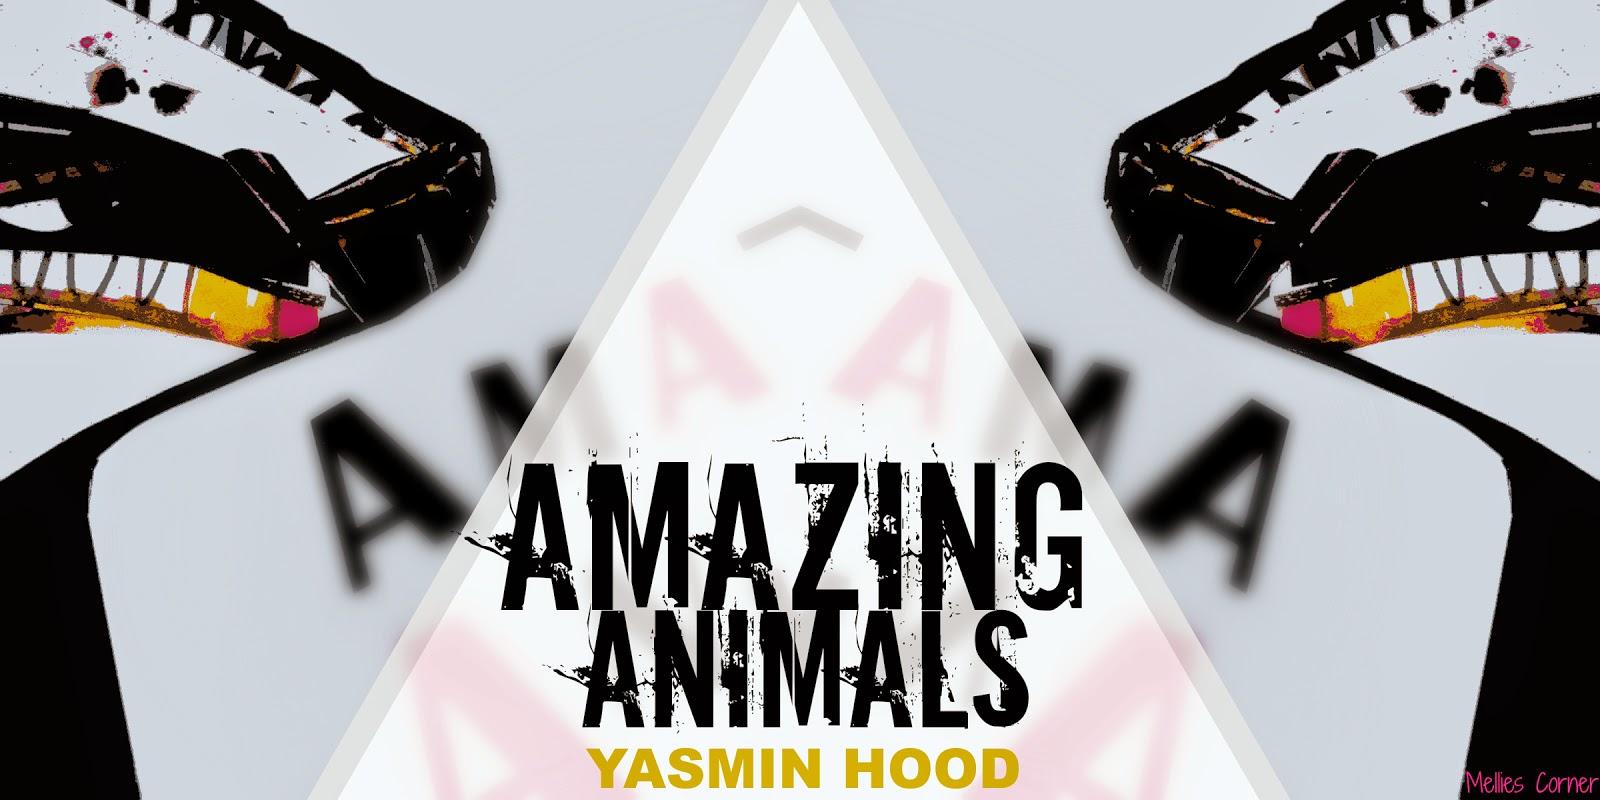 Amazing Animals Yasmin Hood - Mellies Corner